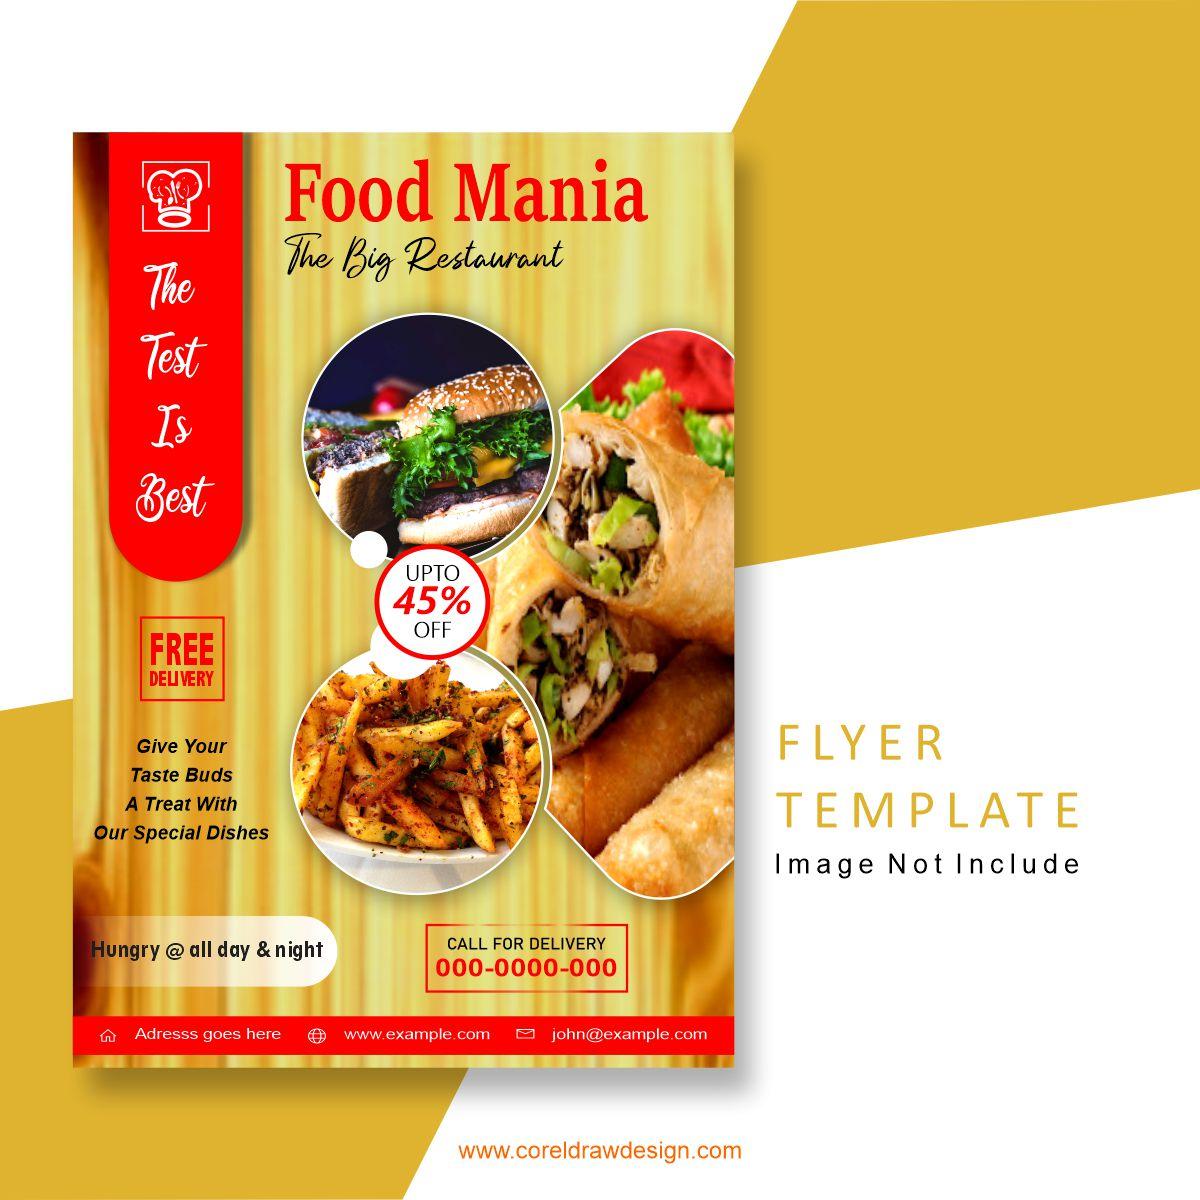 Download Food Mania Flyer Design Vector Template